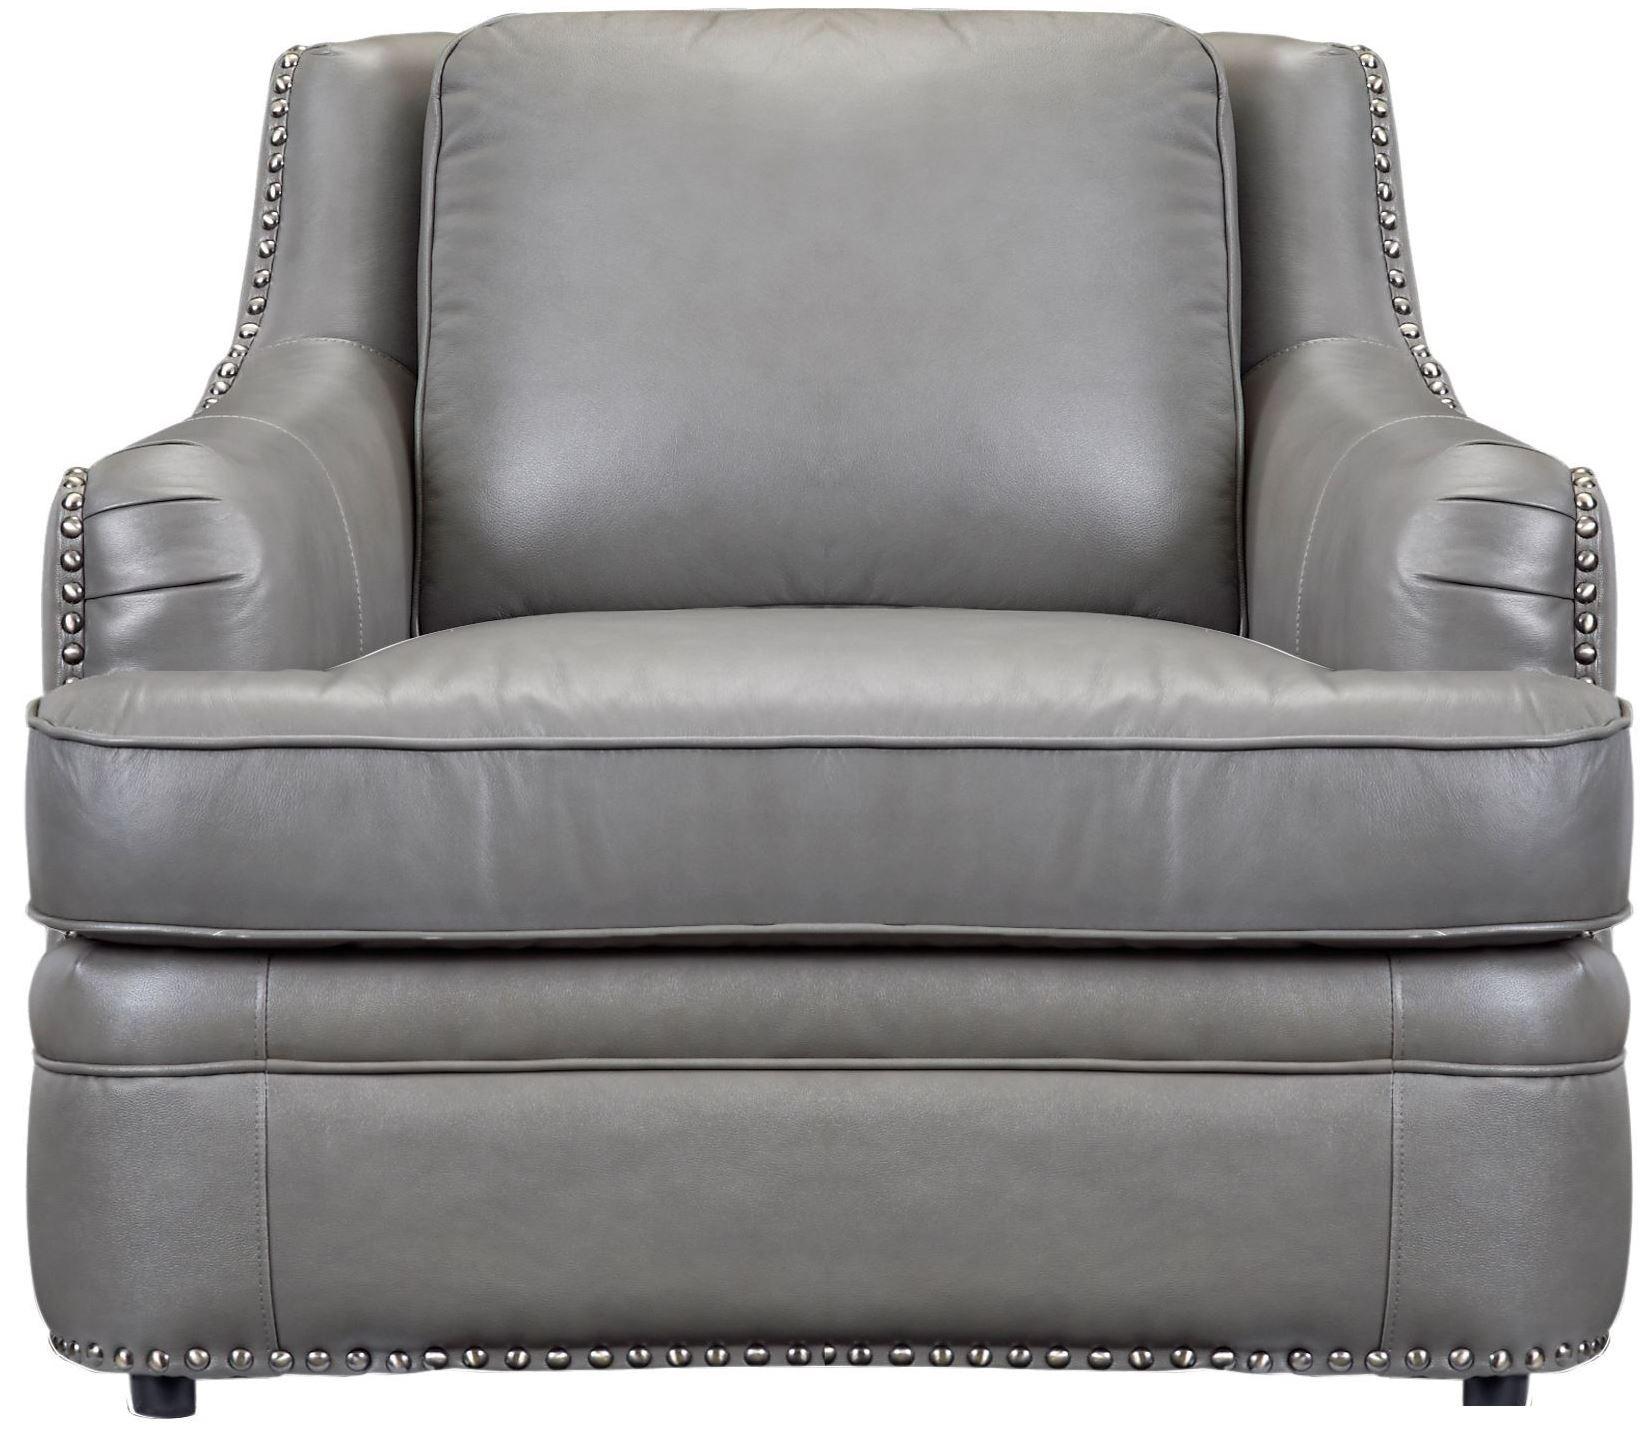 Tulsa Dark Gray Swivel Chair – Brown's Furniture Showplace Within Dark Grey Swivel Chairs (Image 20 of 20)